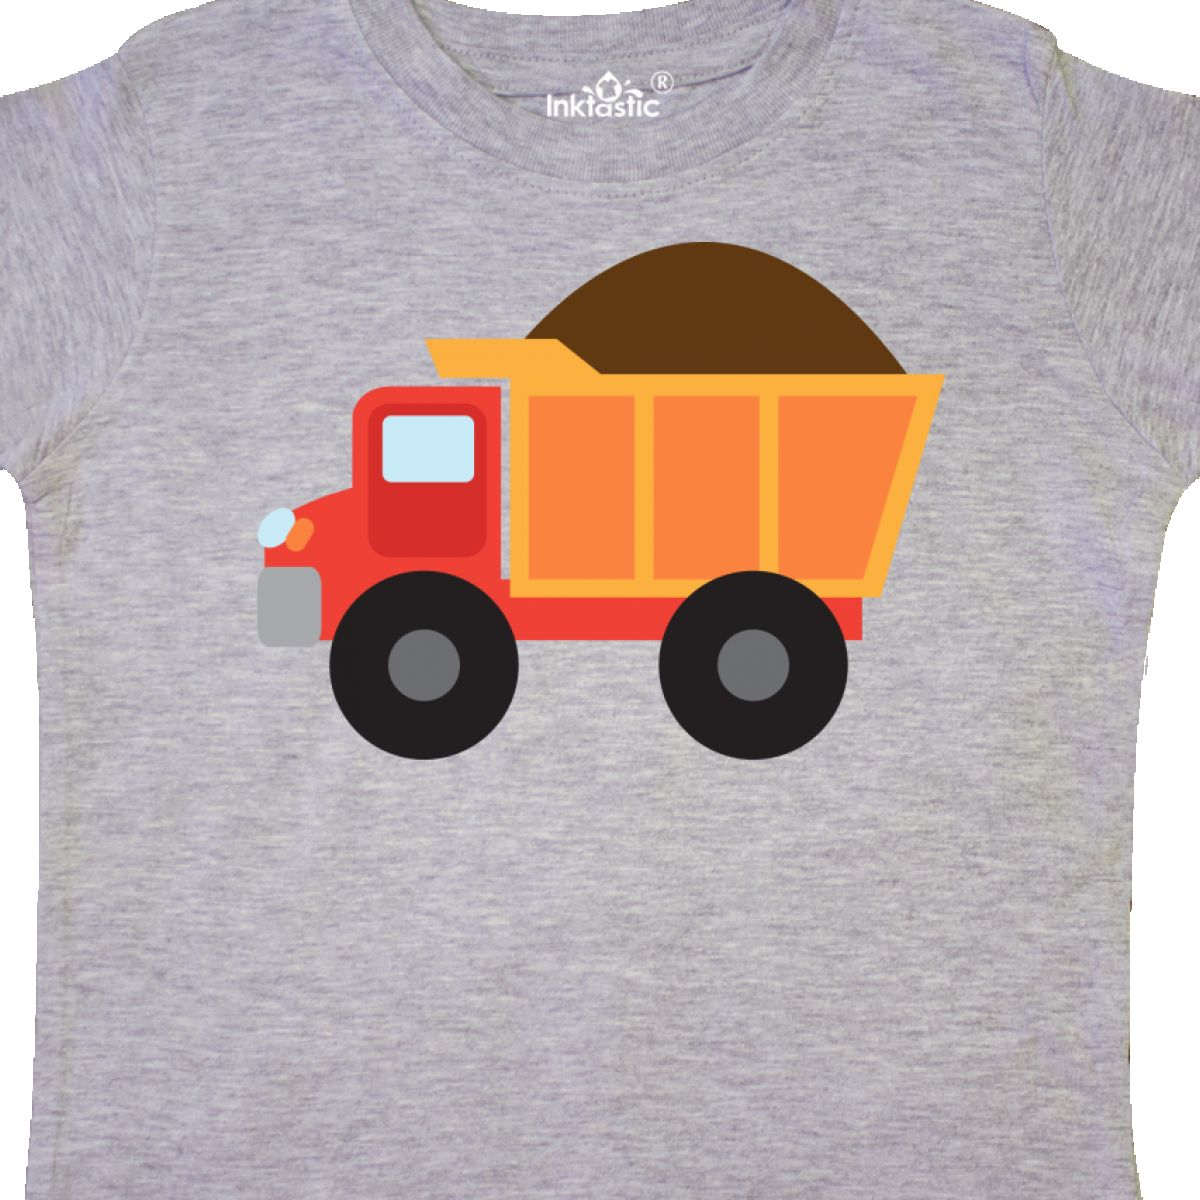 Inktastic-Work-Truck-Construction-Vehicle-Toddler-T-Shirt-Trucks-Vehicles-Cute thumbnail 12